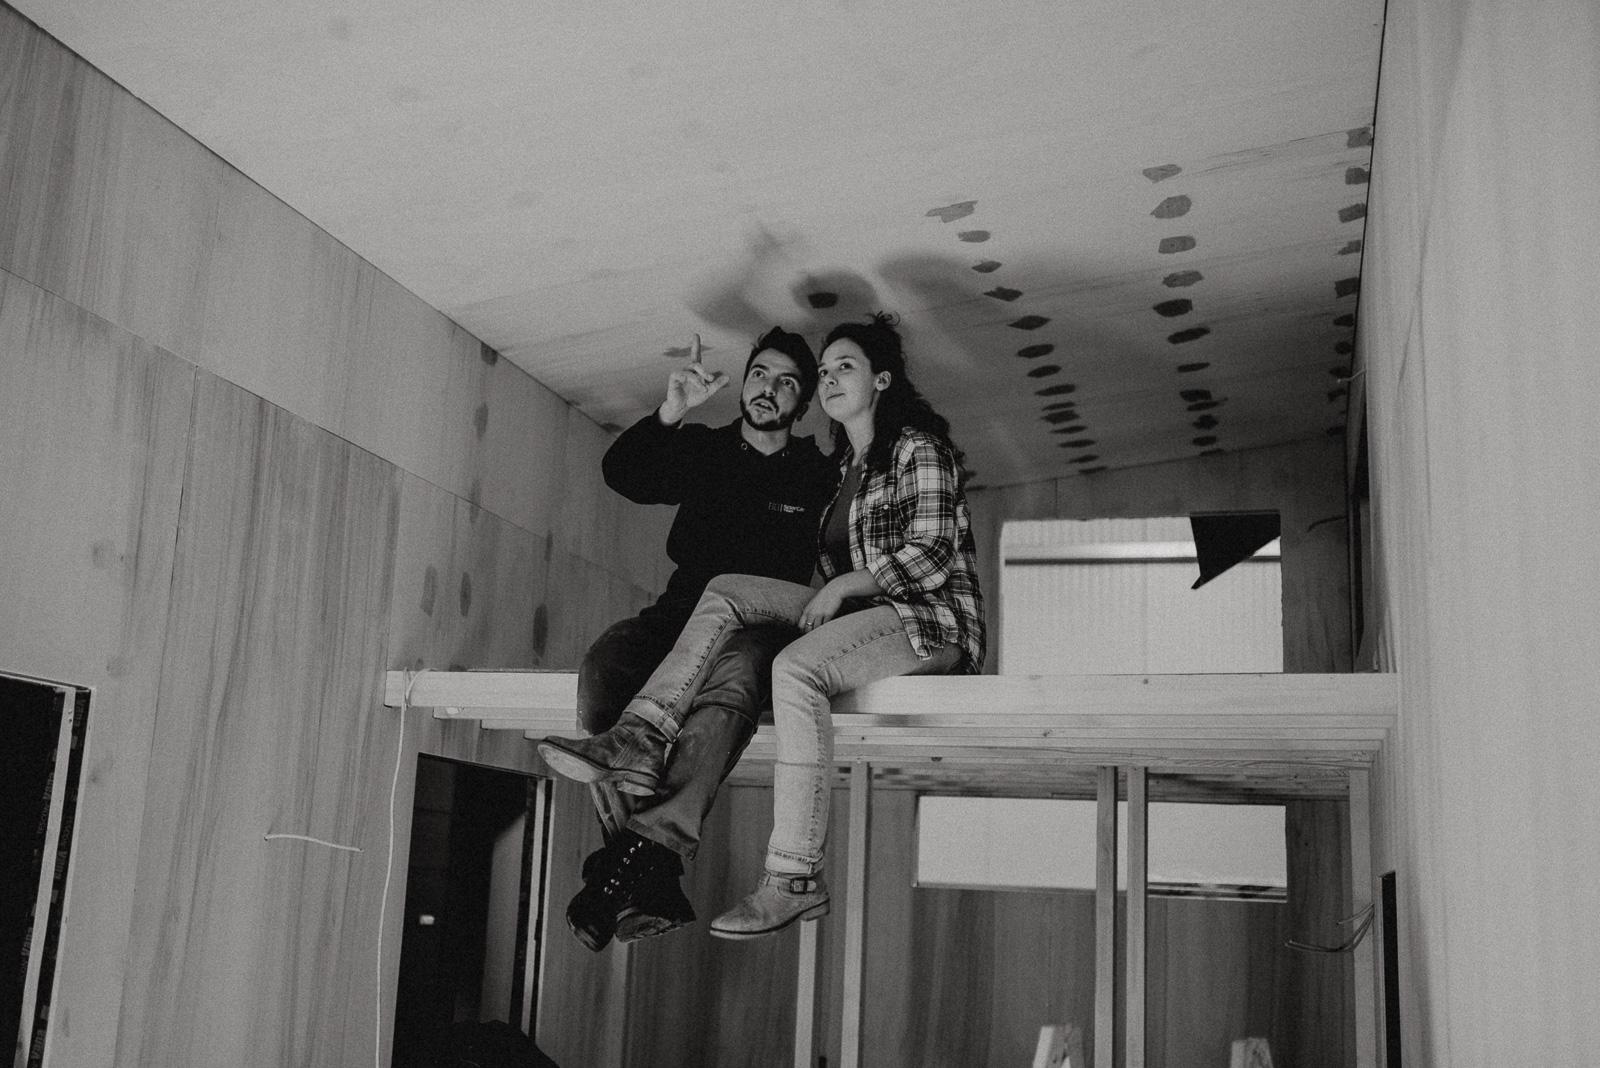 043-dokumentarische-fotografie-tinyhouse-ecochalet-fotografin-witten